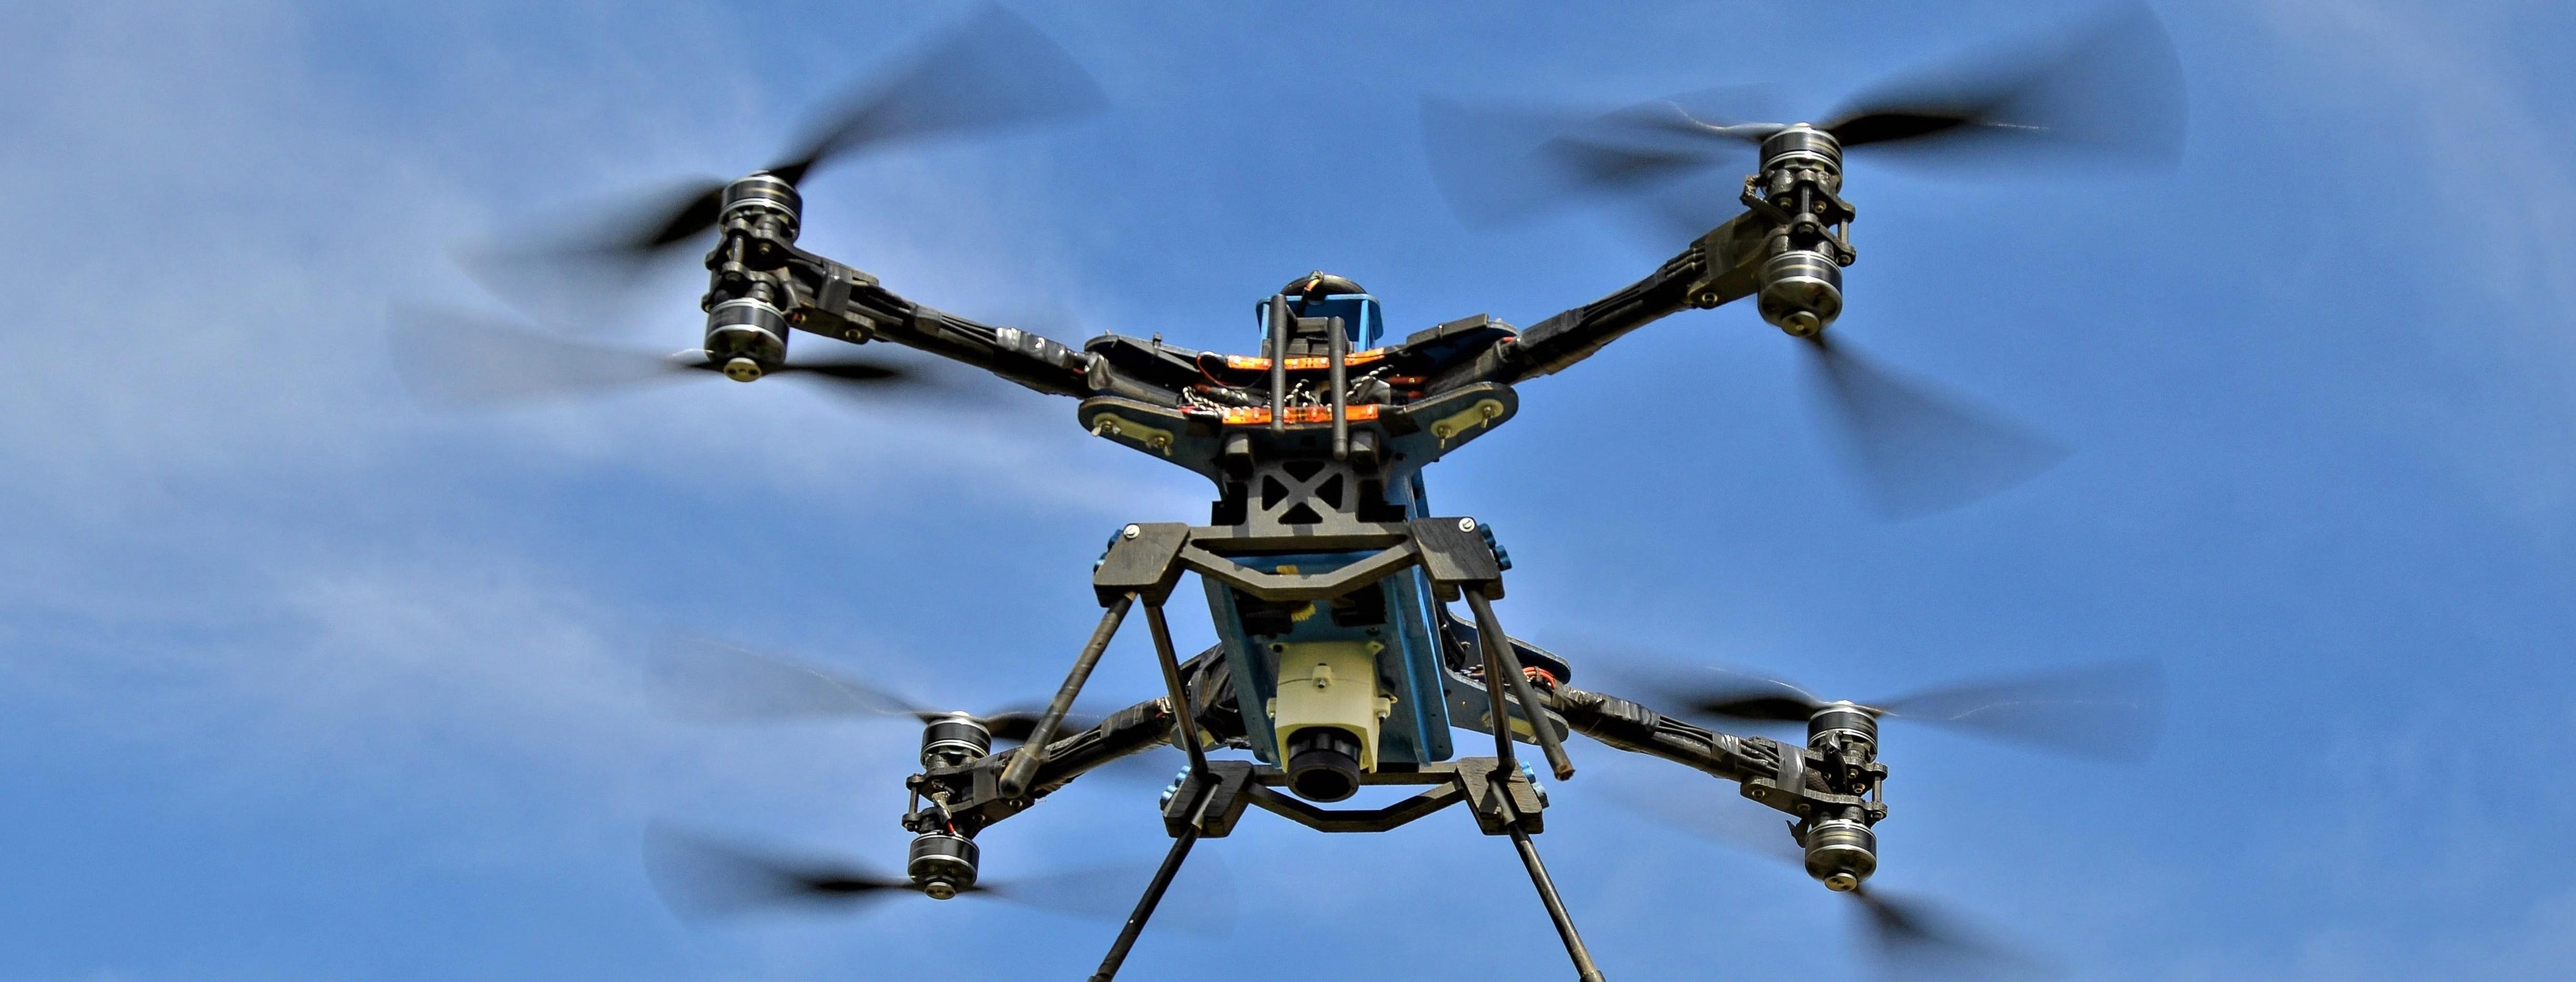 DroneFlying1